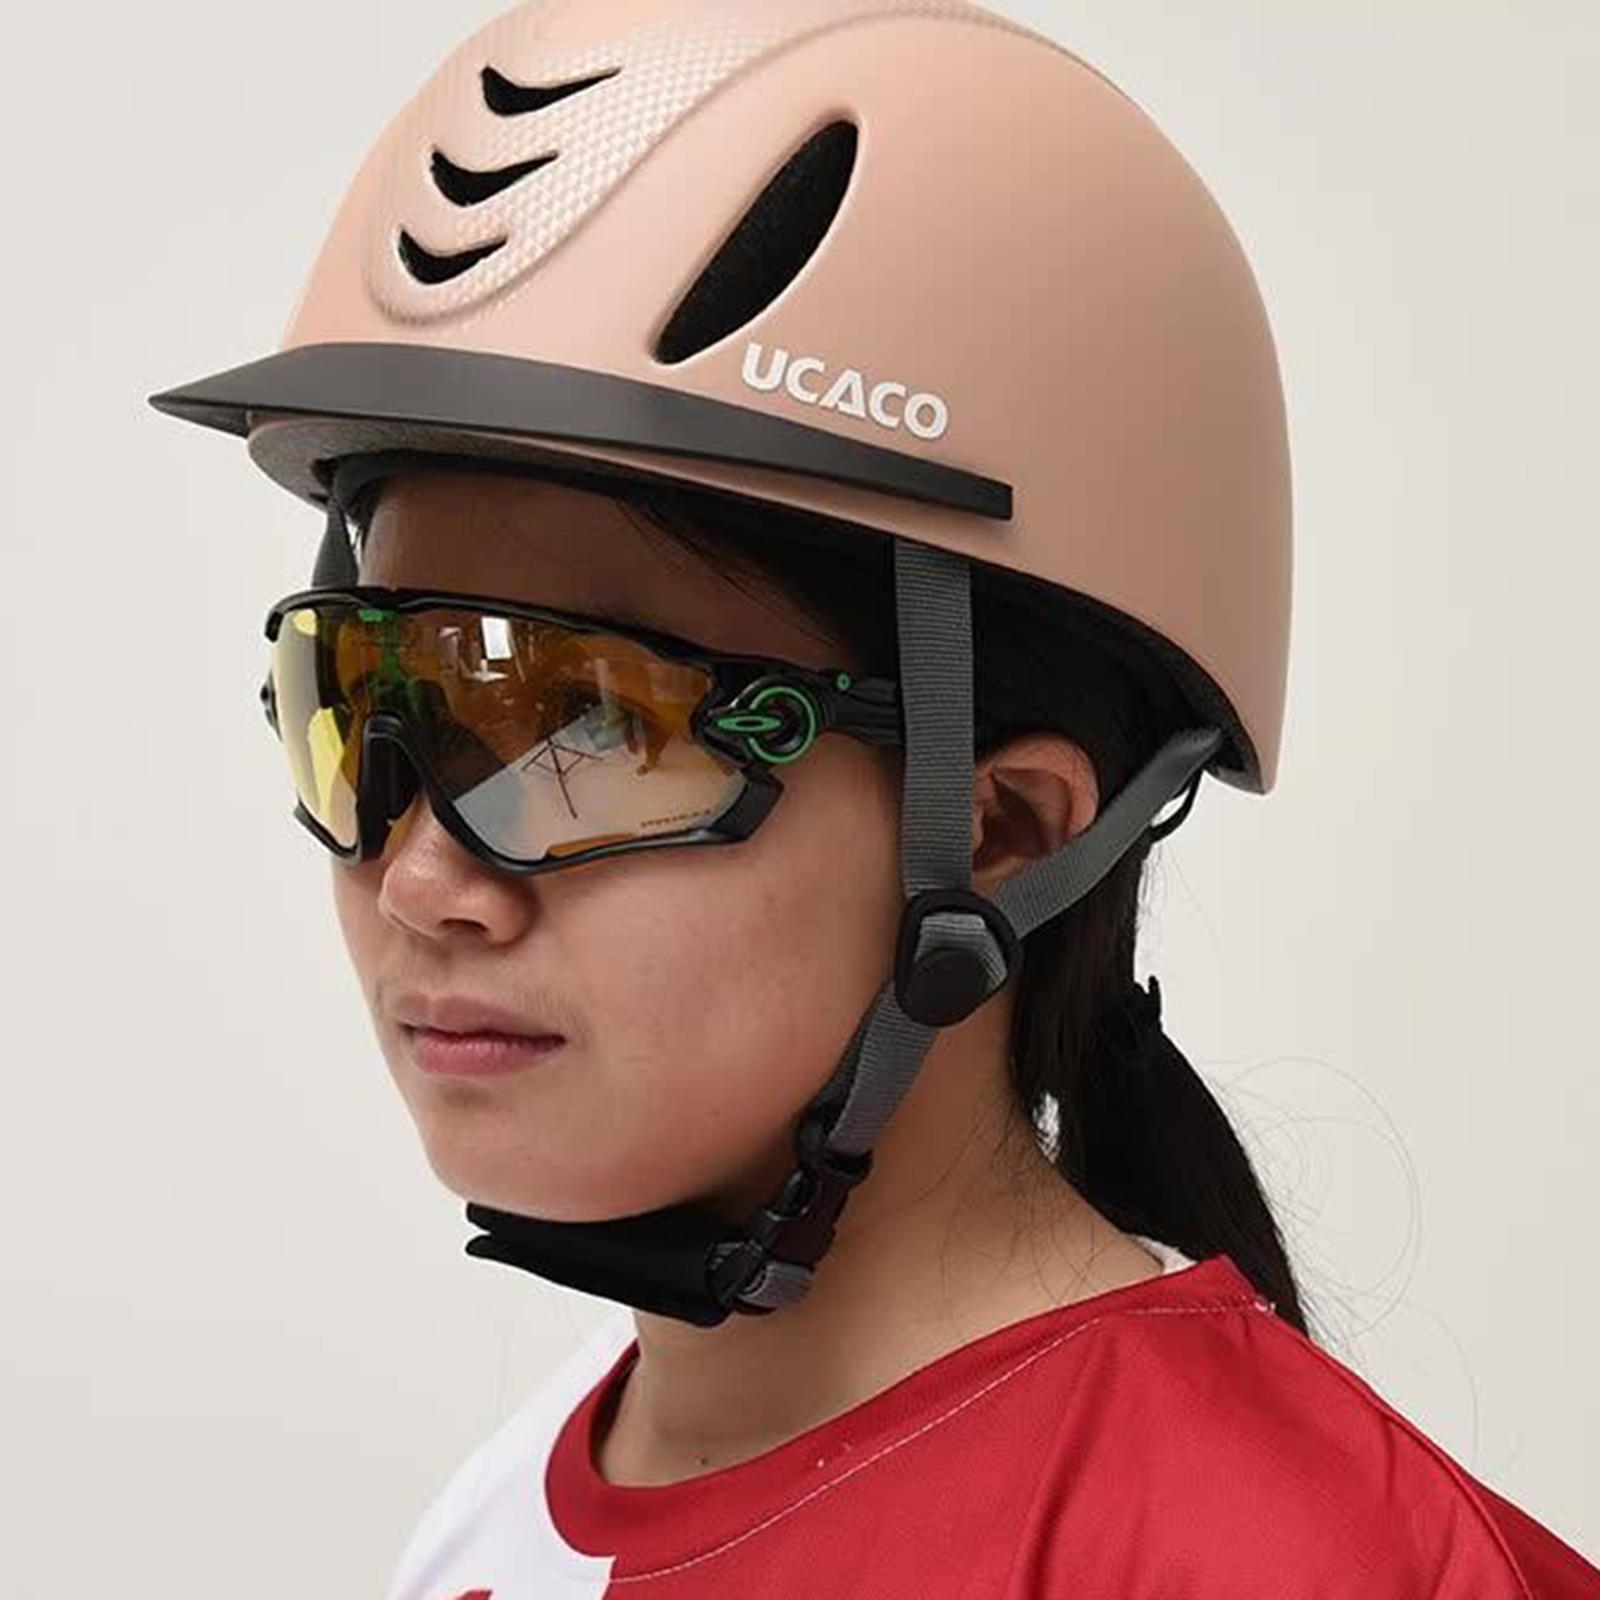 Equestrian Helmet Lightweight Horseback Riding Helmet for over 13 years Old